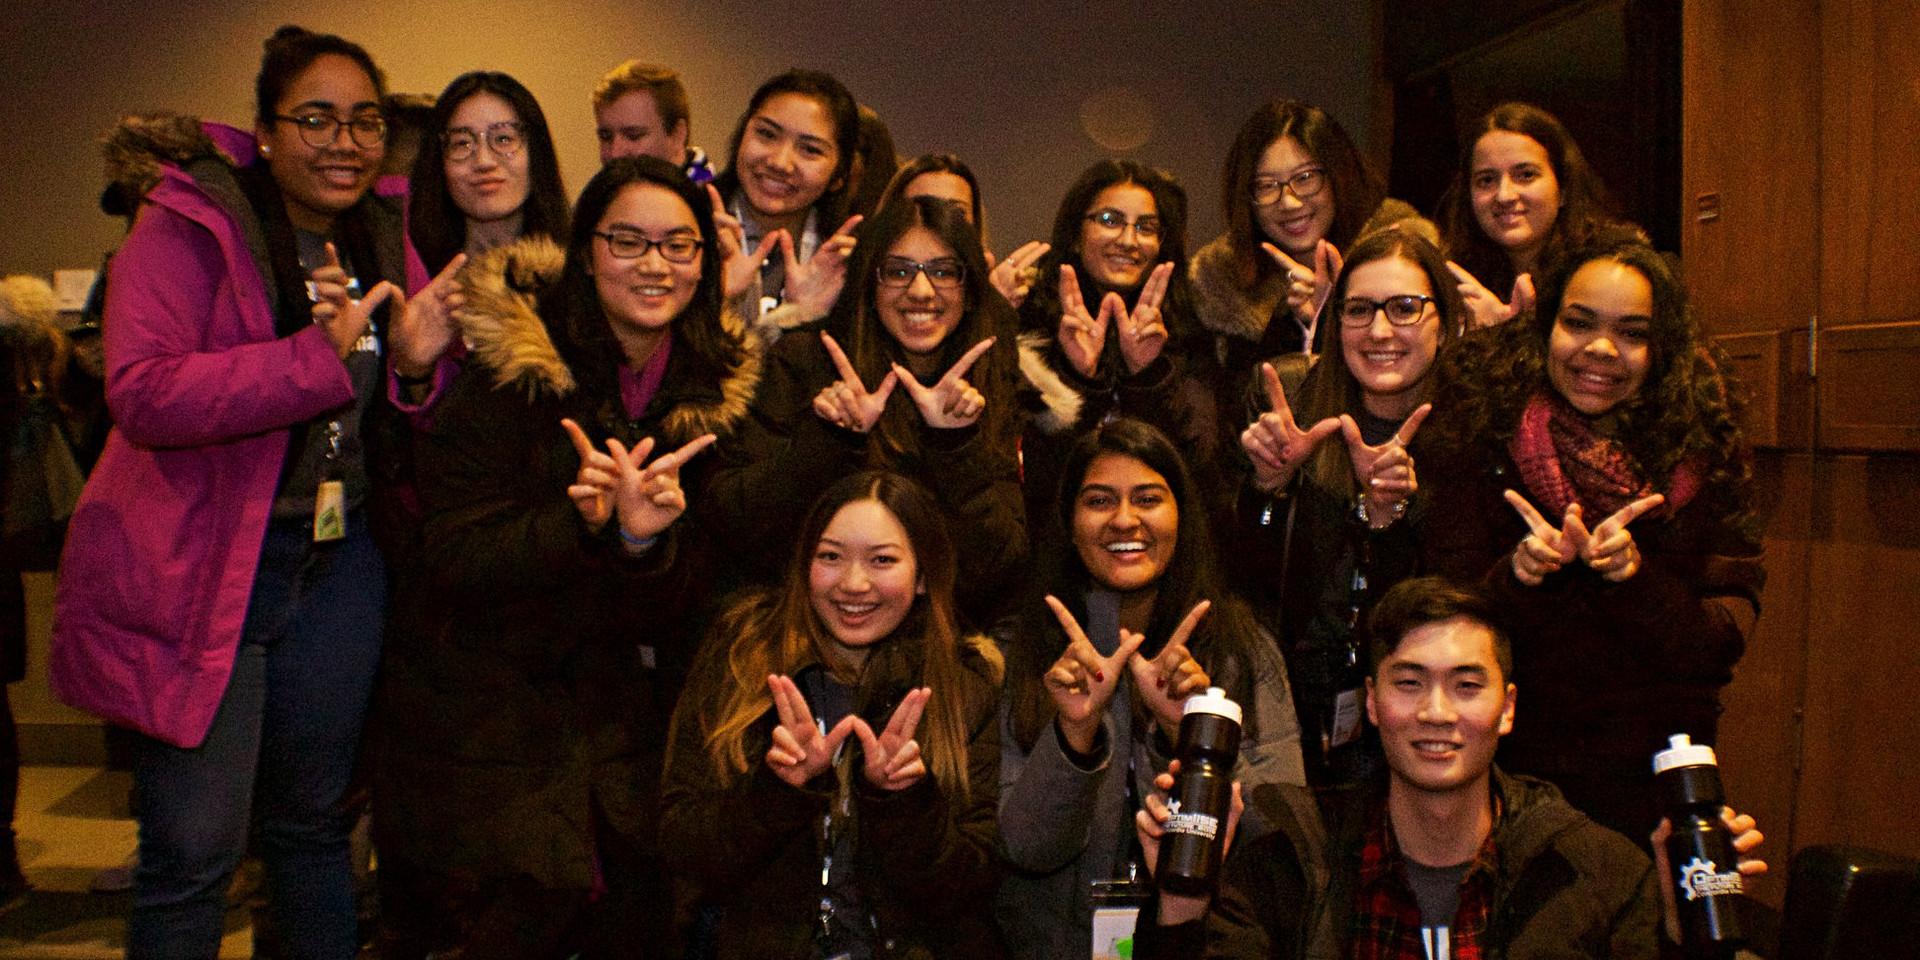 University of Waterloo delegation